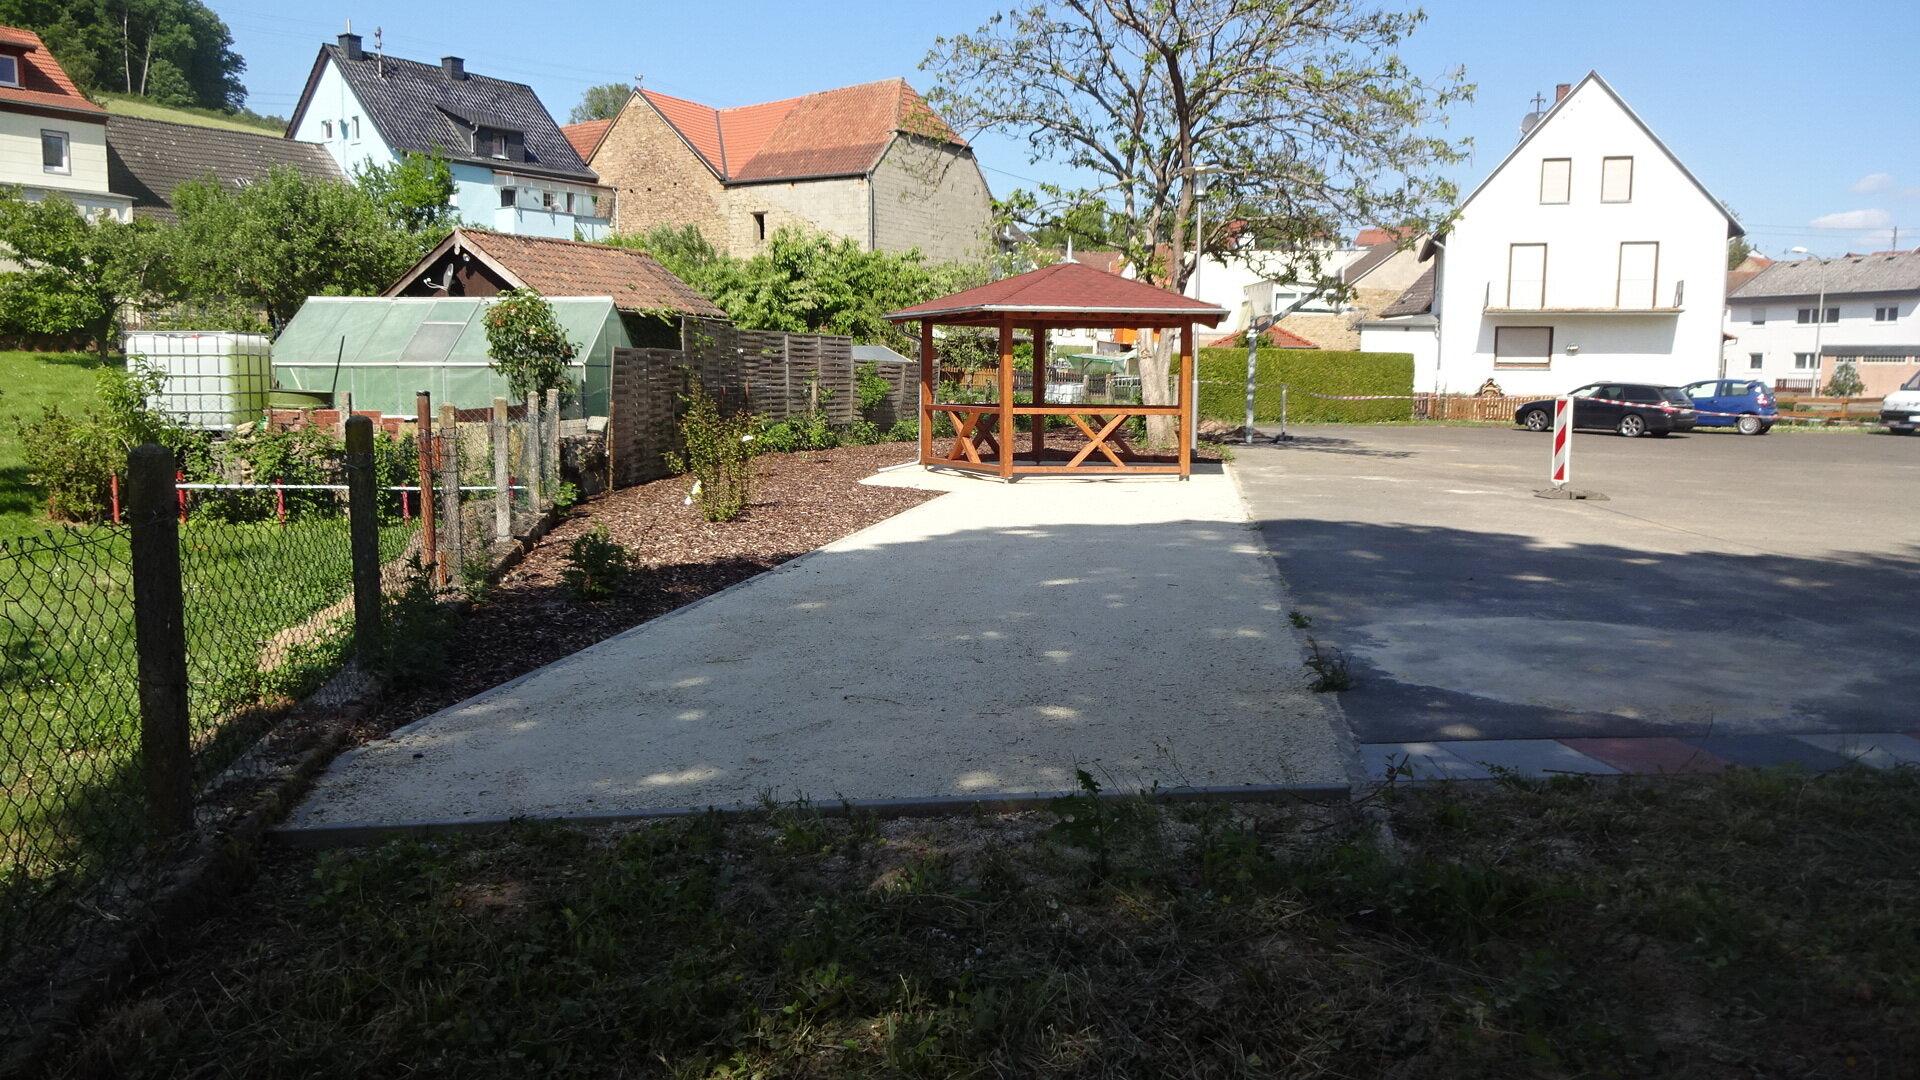 Reipoltskirchen Kerweplatz